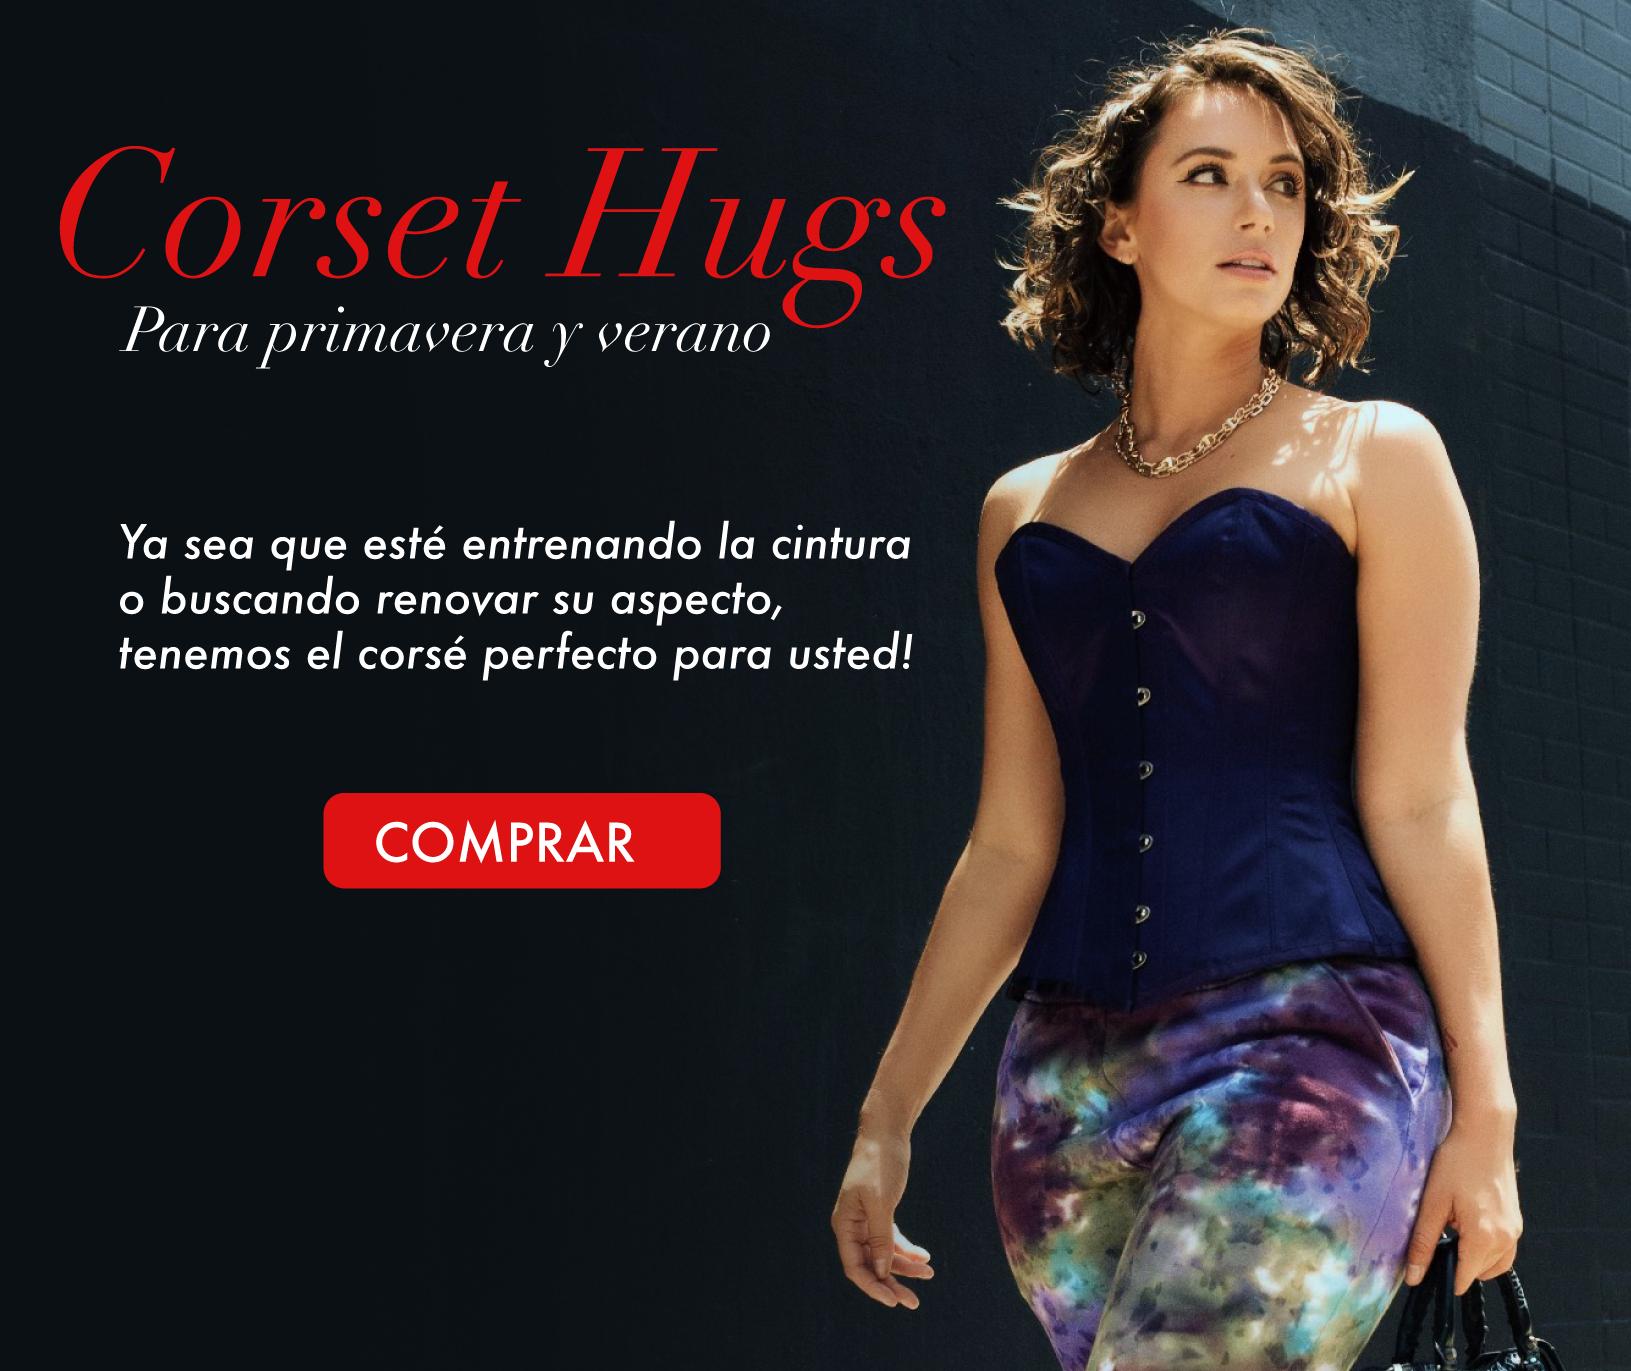 dita corset